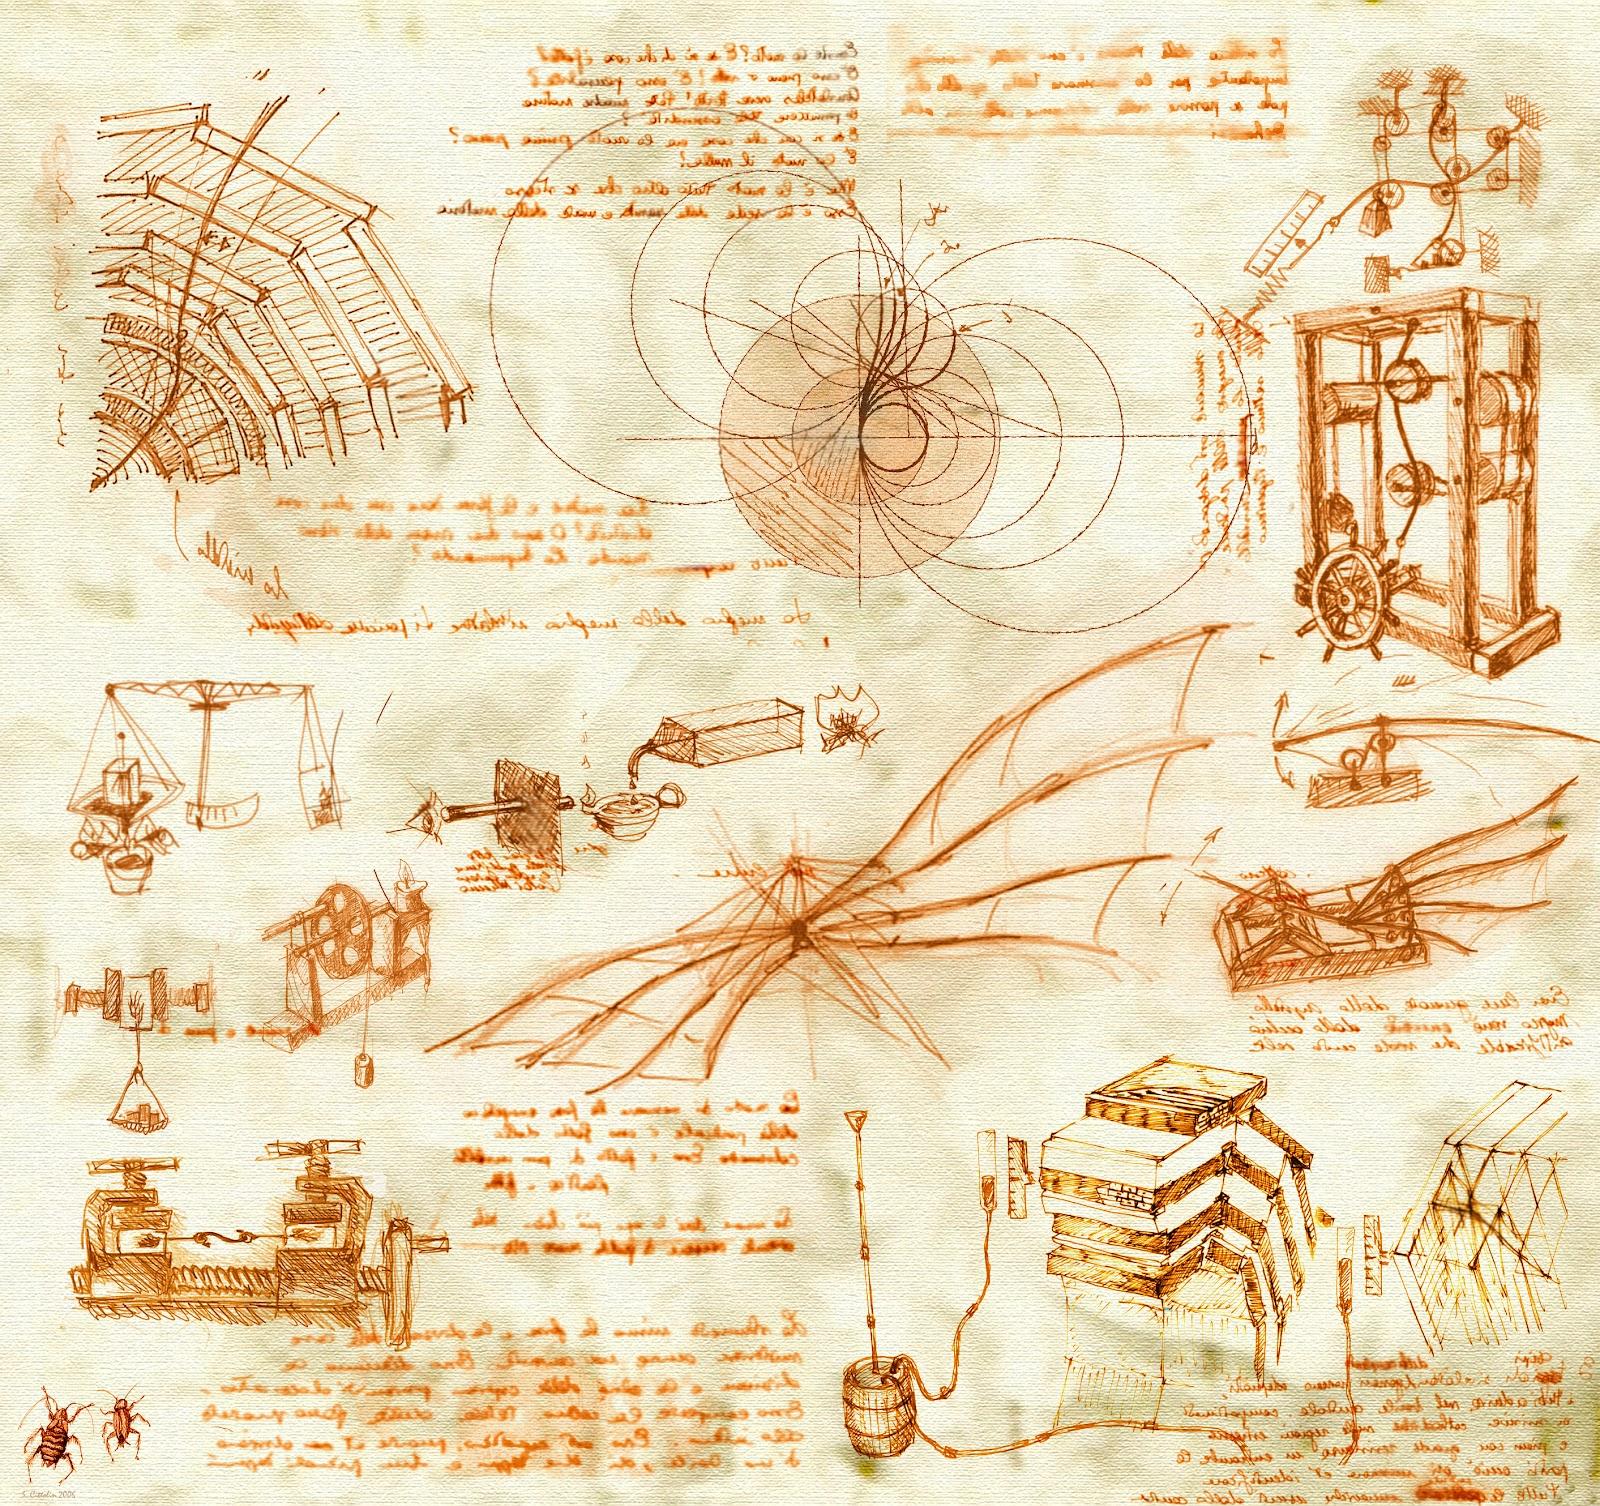 Leonardo da Vinci sketch by HatPup on DeviantArt